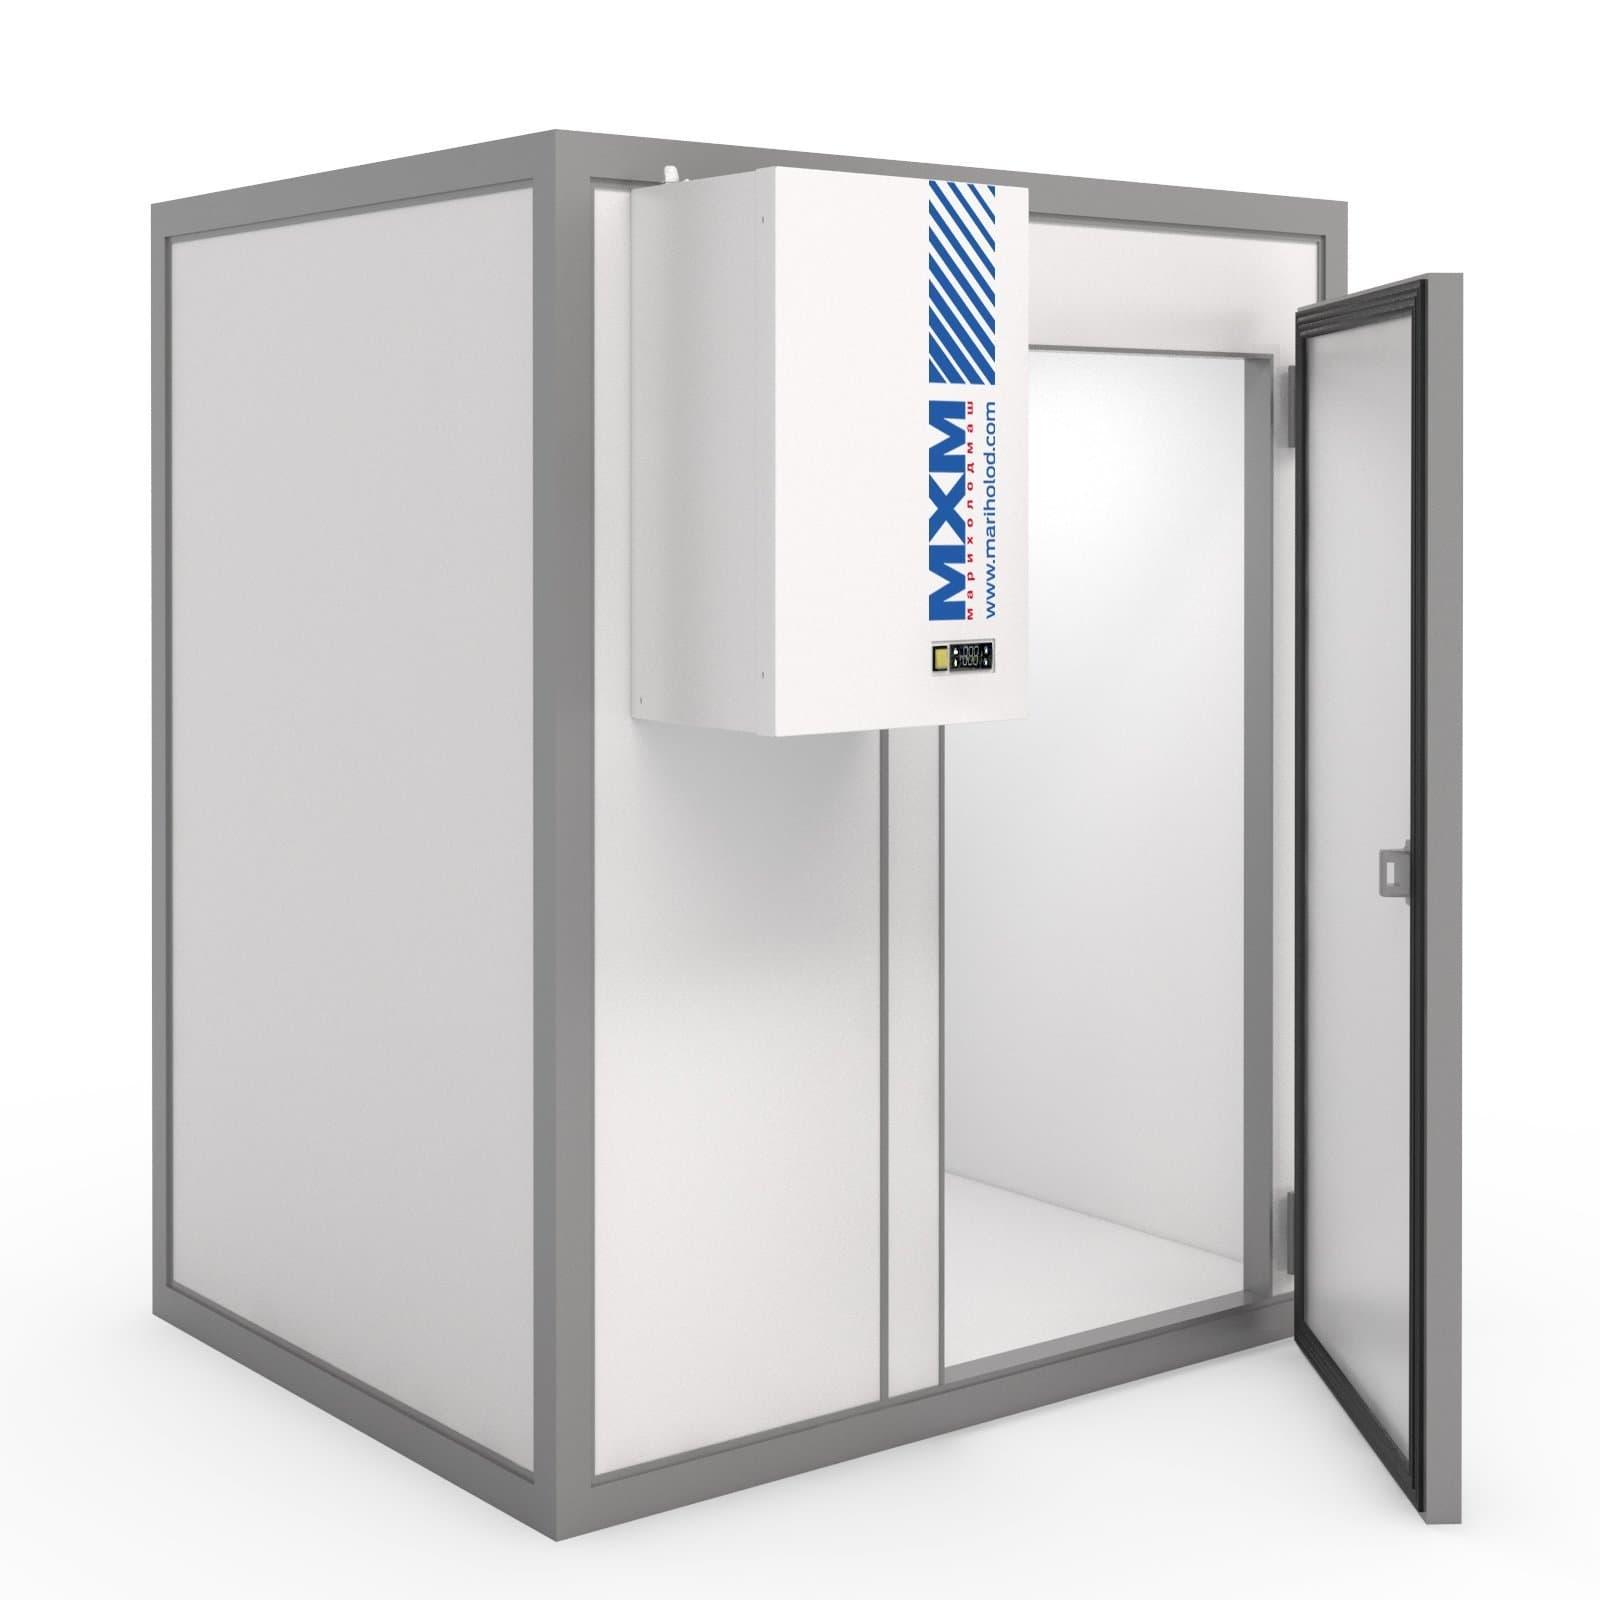 Камера холодильная МХМ КХН-31,21 1660×10360×2200